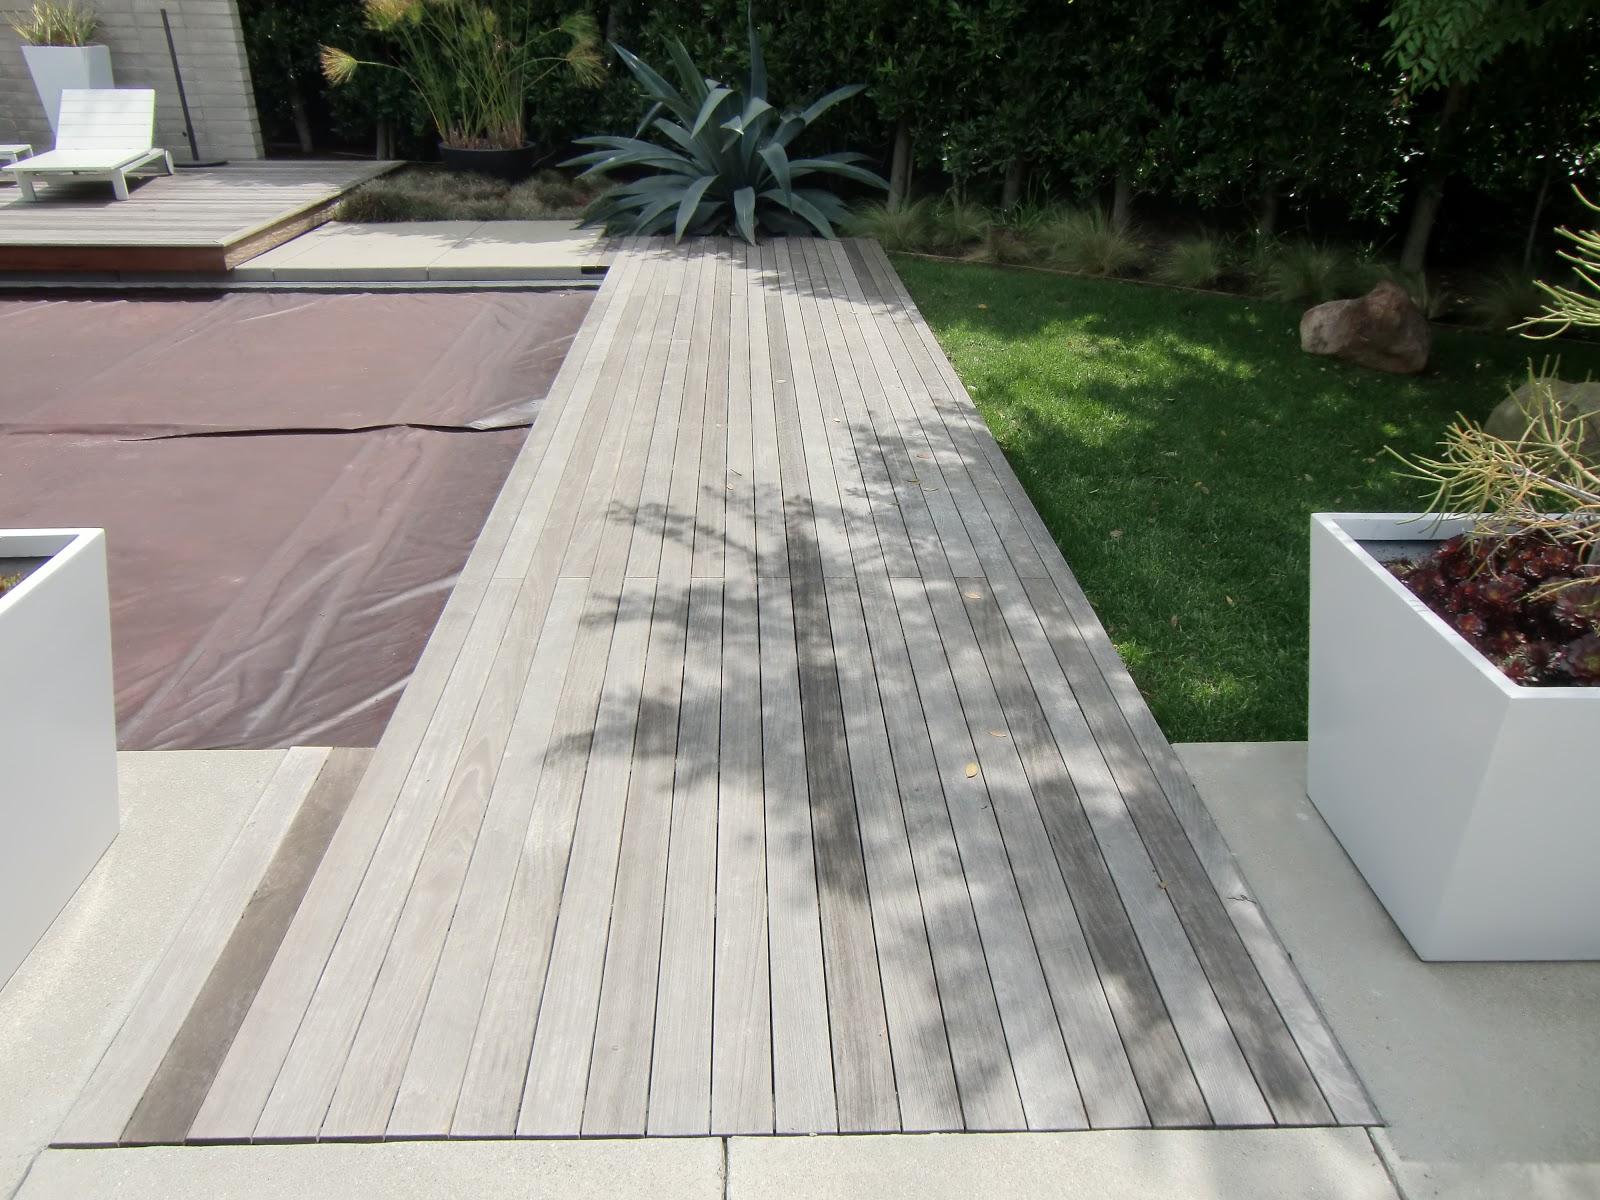 Ipe wood decking deck maintenance restoration and for Ipe decking